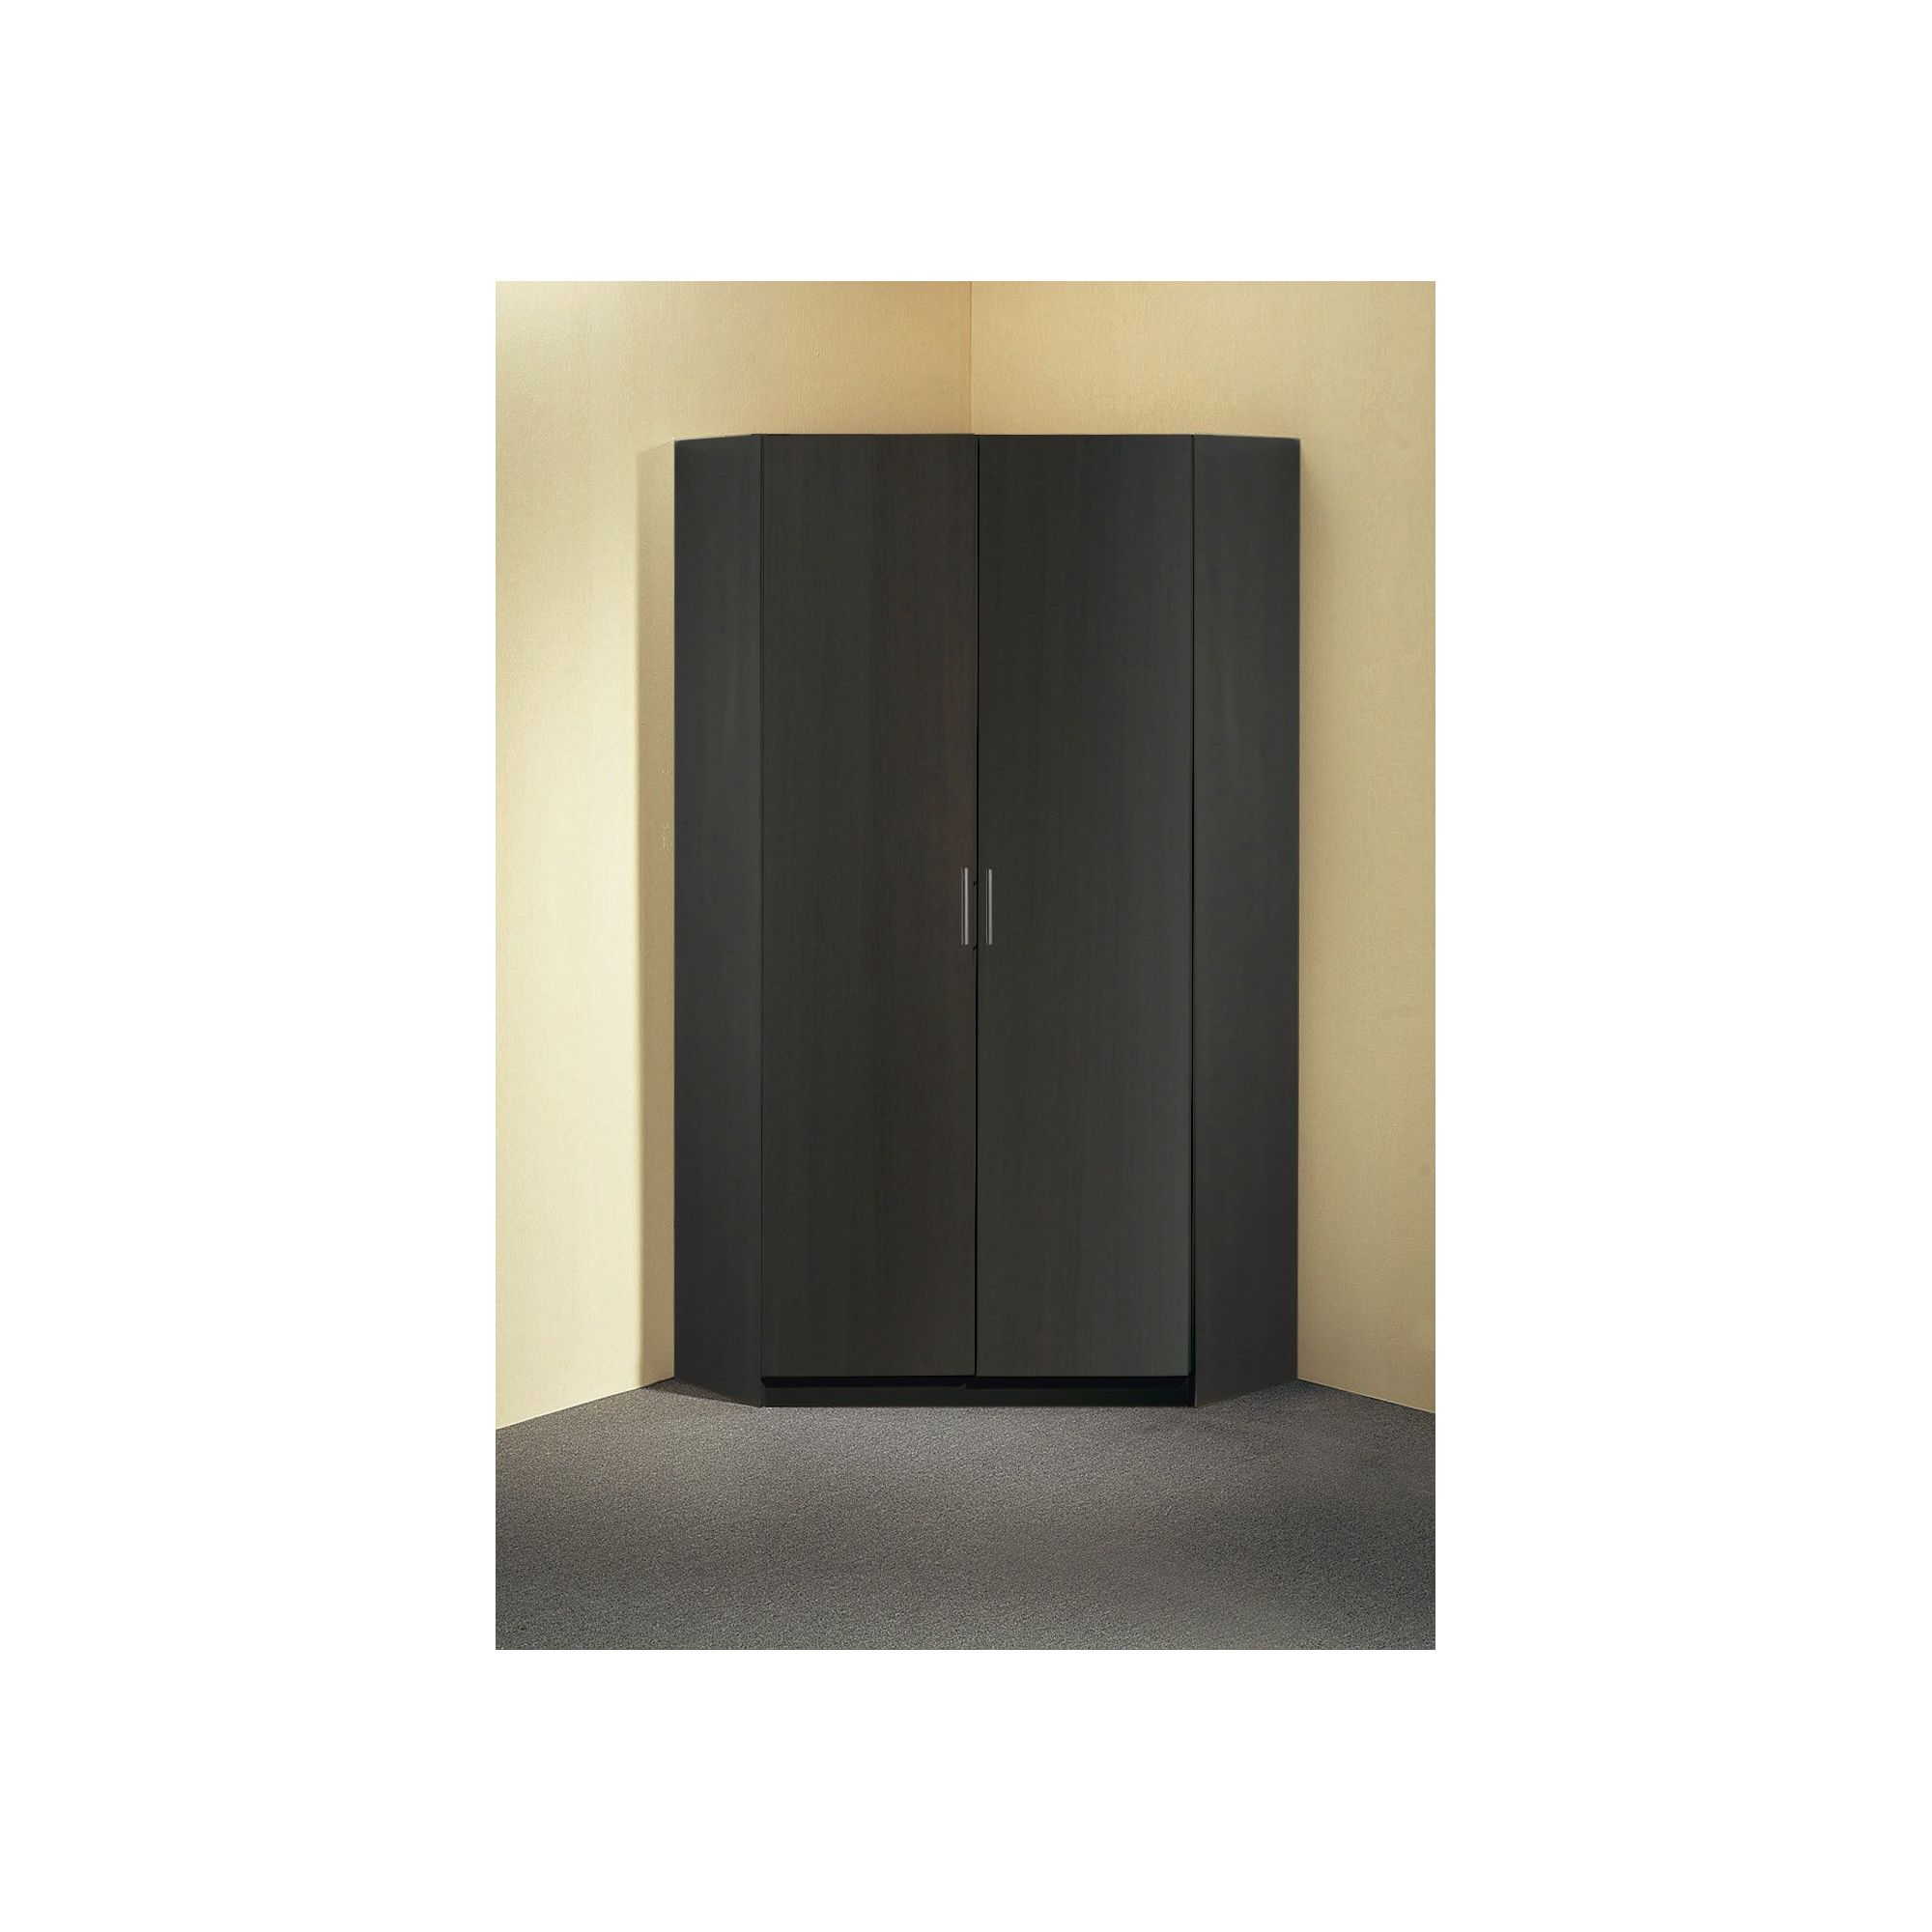 Amos Mann furniture Venice 2 Door Cornerwardrobe - Wenge at Tescos Direct